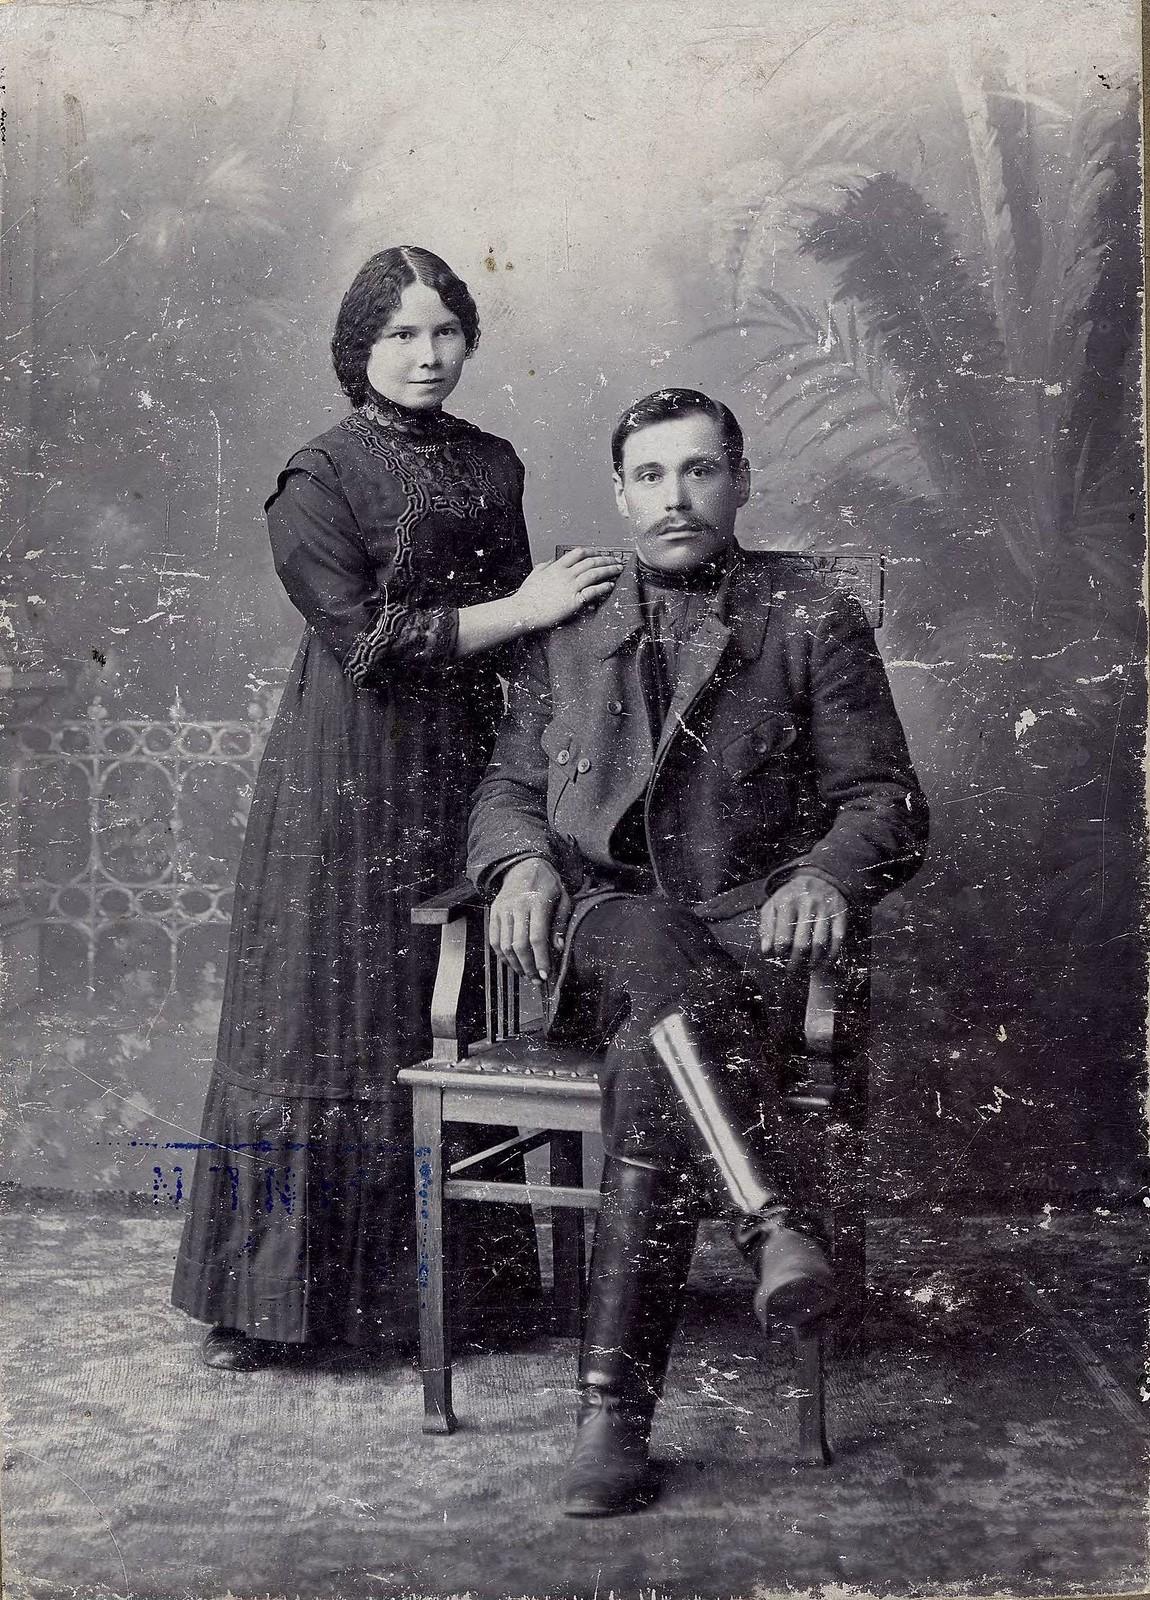 1916. Мещанин Легостаев Павел Дмитриевич с супругой